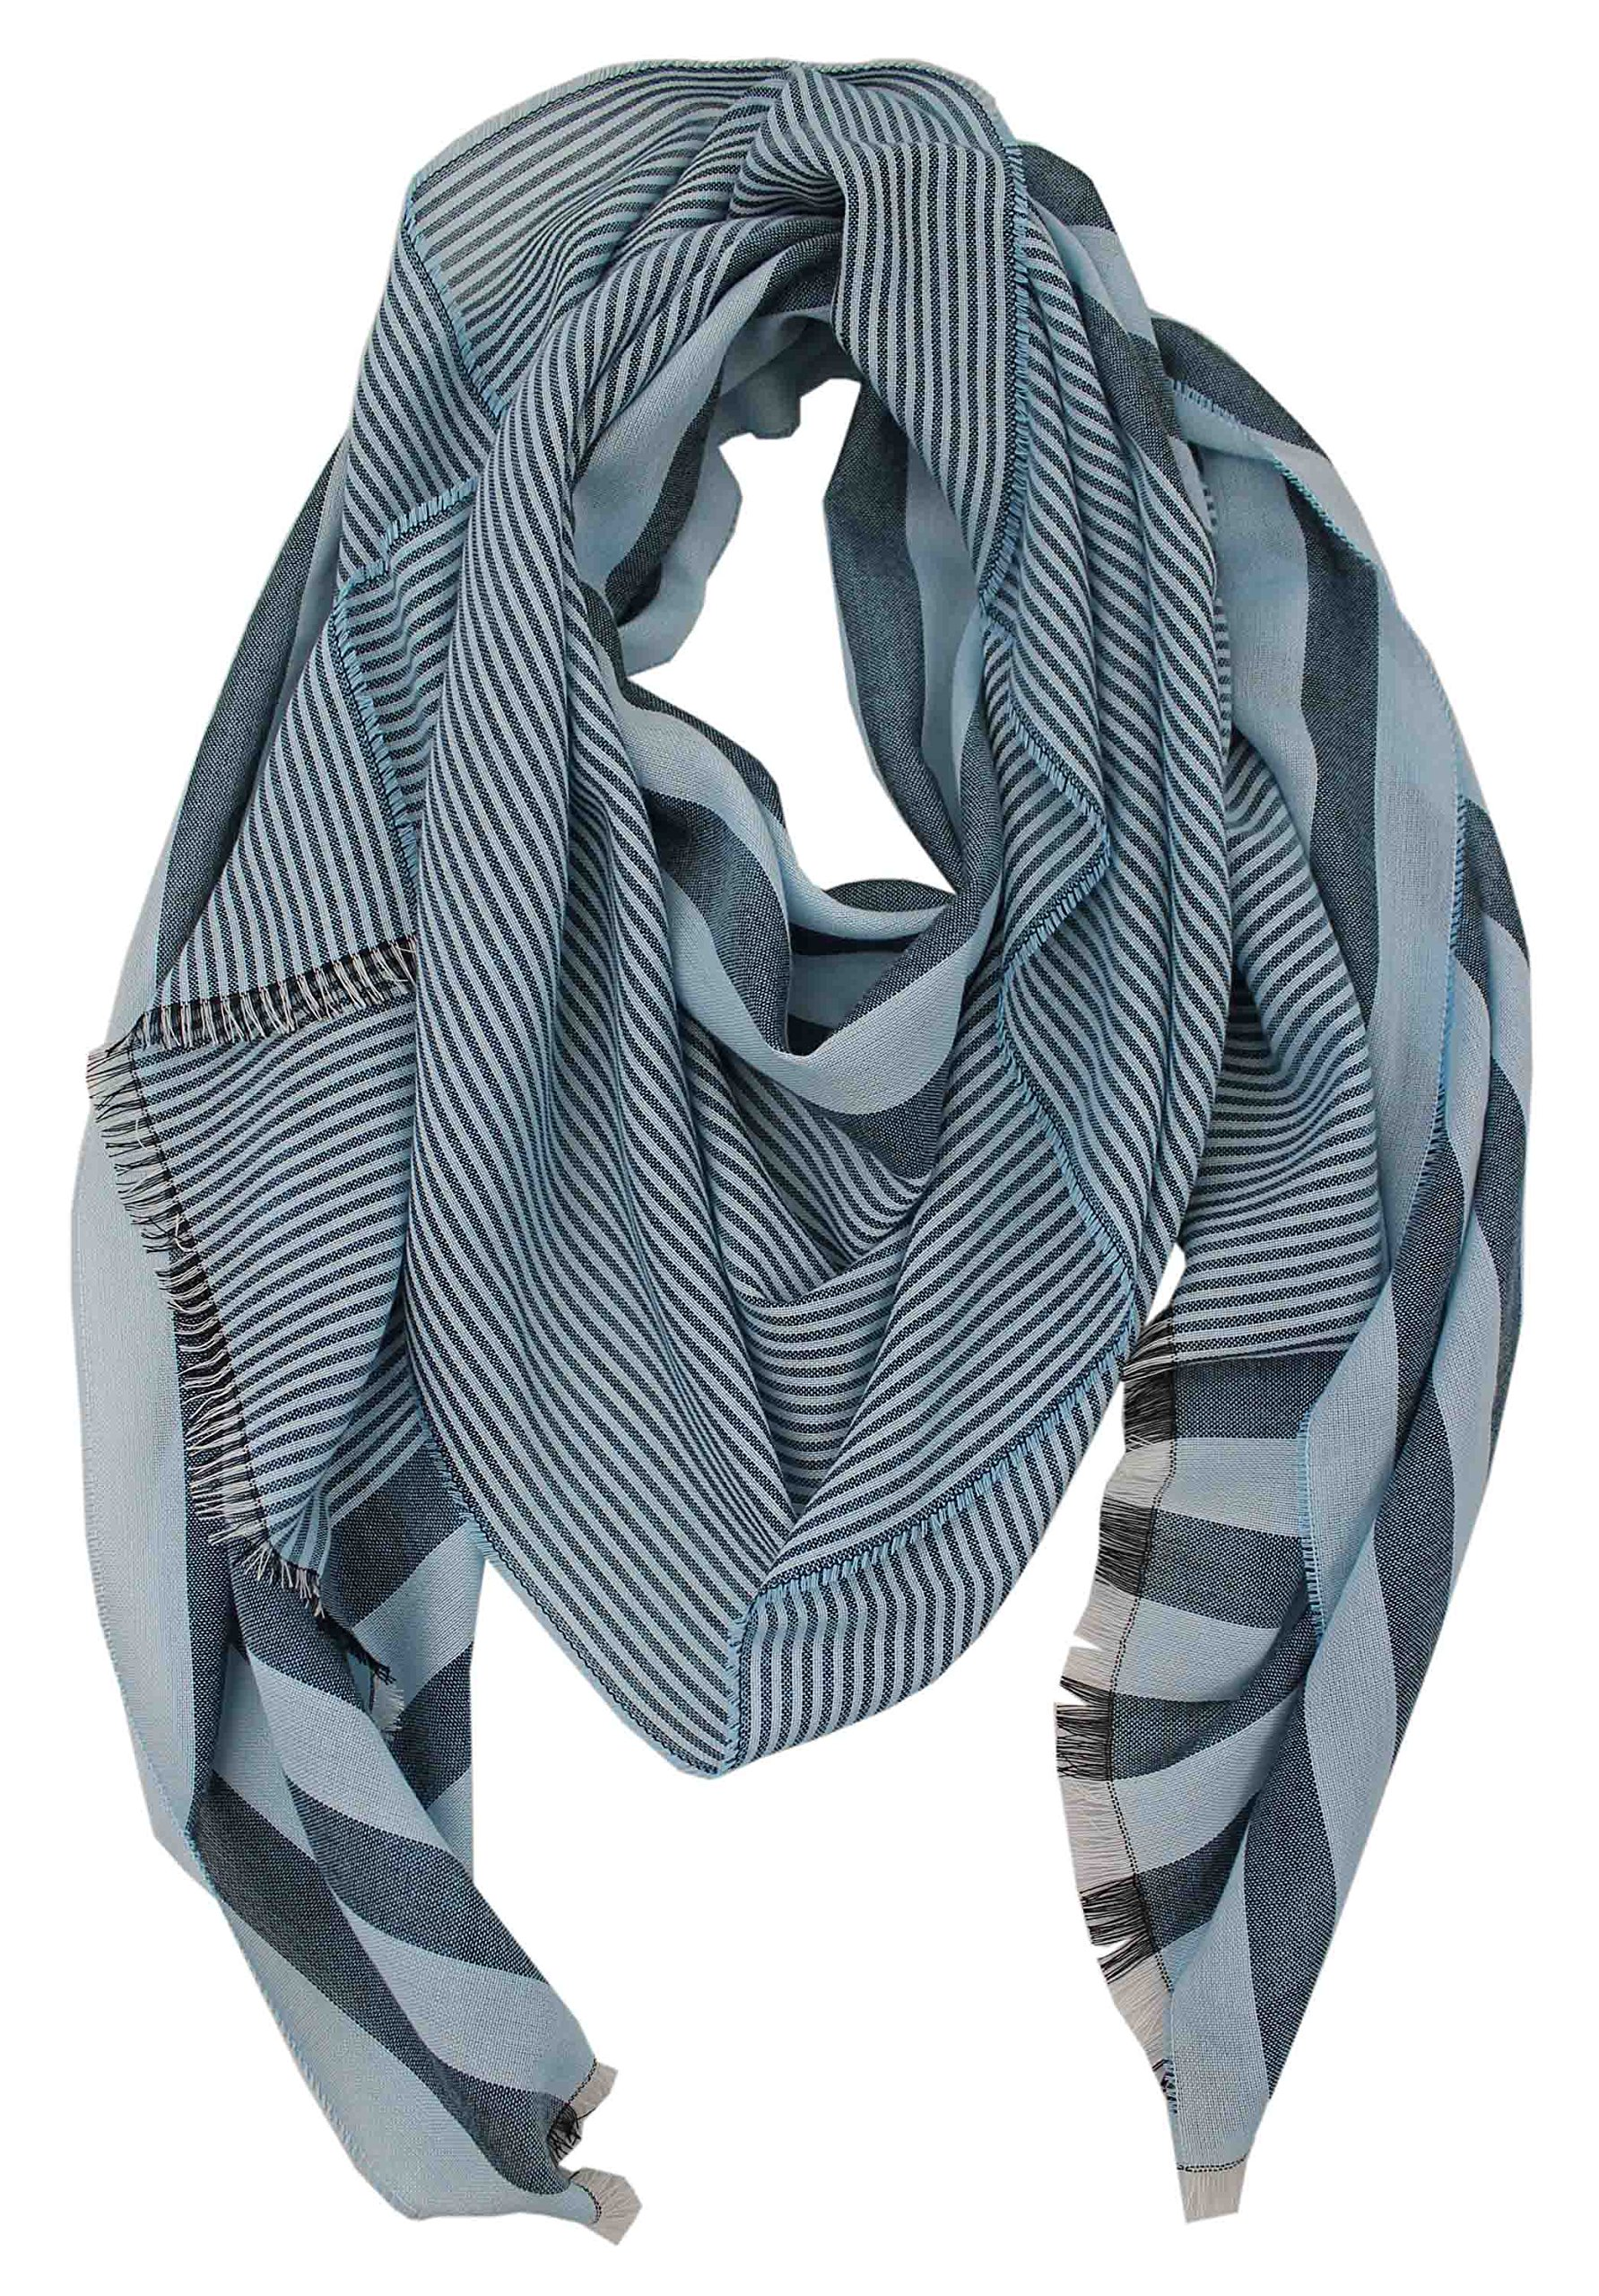 Cotton scarf Summer scarf Rotfuchs stripes light black blue 200 x 52 cm Made in Germany